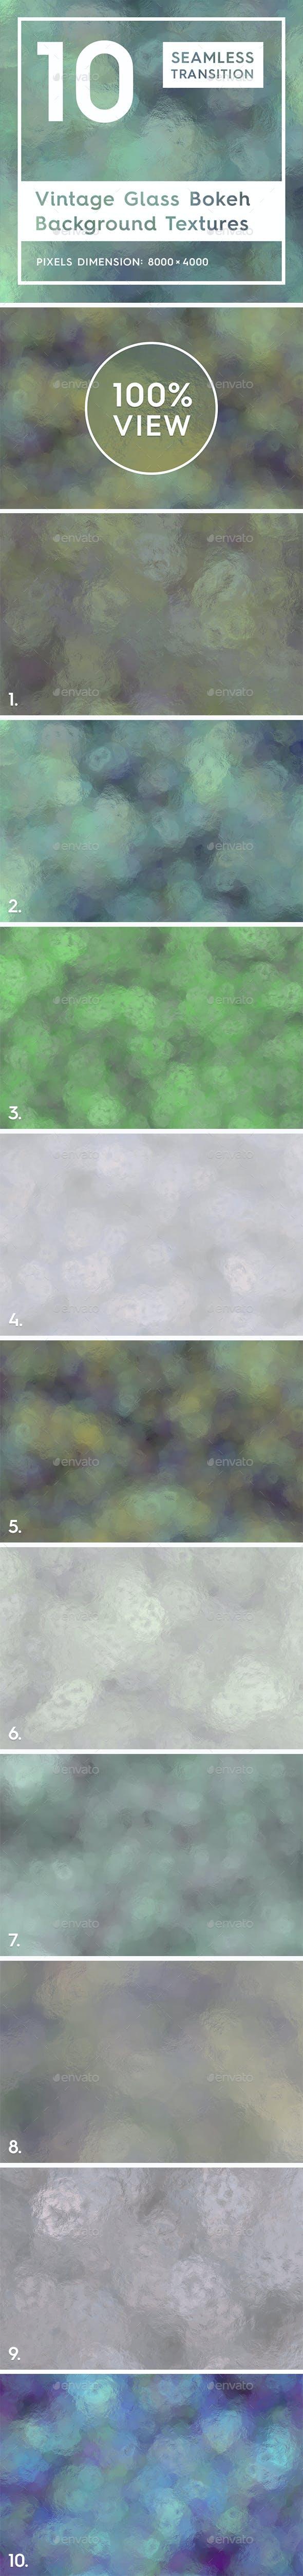 10 Vintage Glass Bokeh Backgrounds - 3DOcean Item for Sale